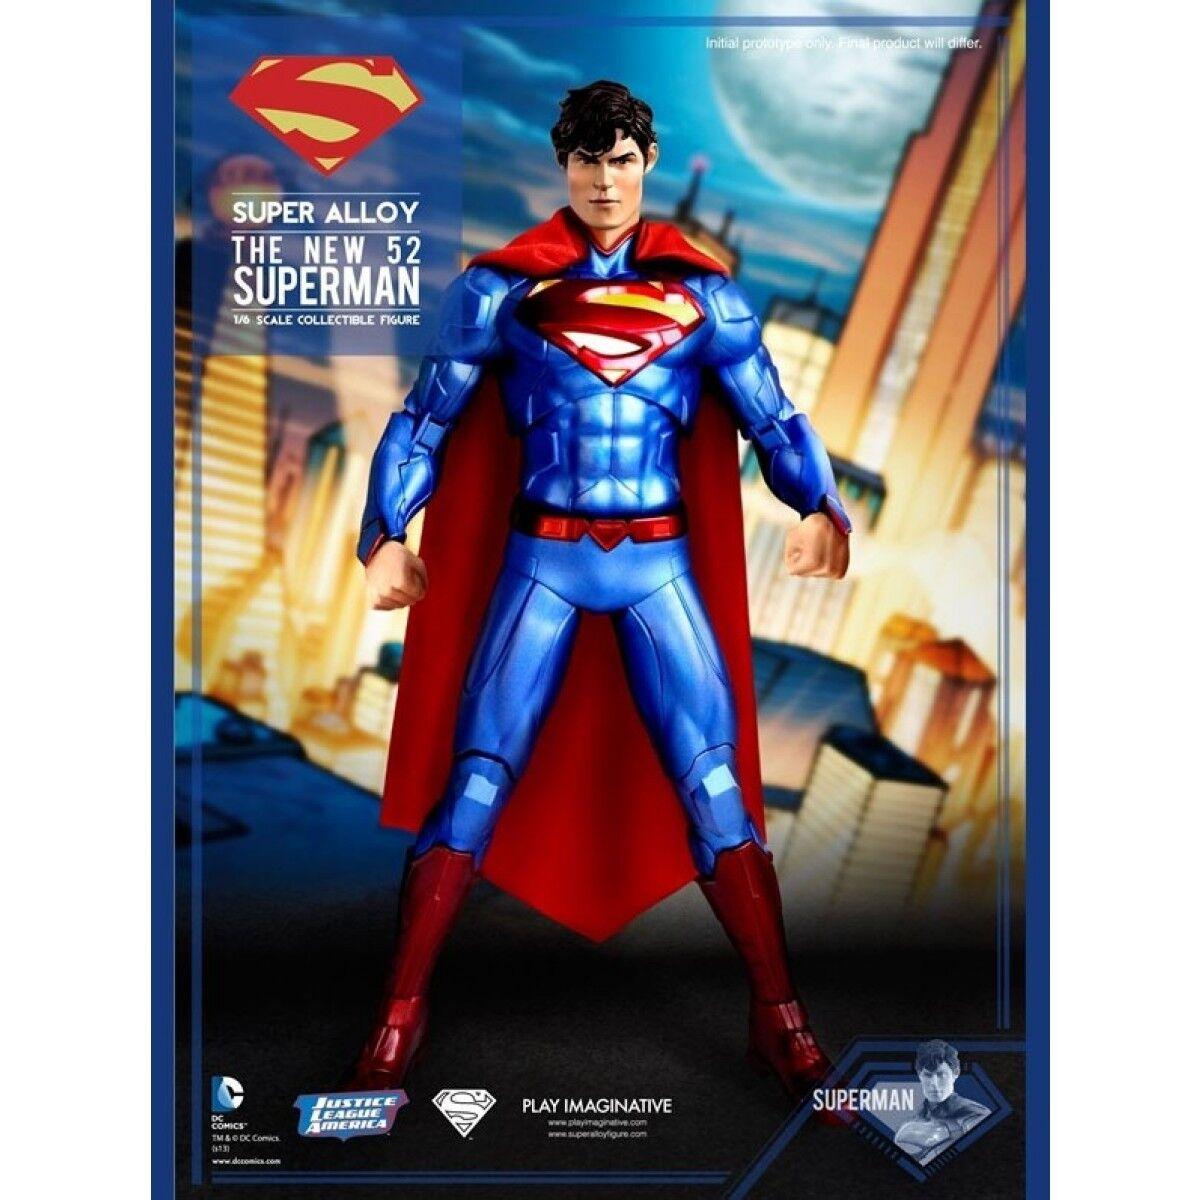 Super Alloy Superman Die-Cast 1/6 Sixth Scale Figure Exclusive Play Imaginitive